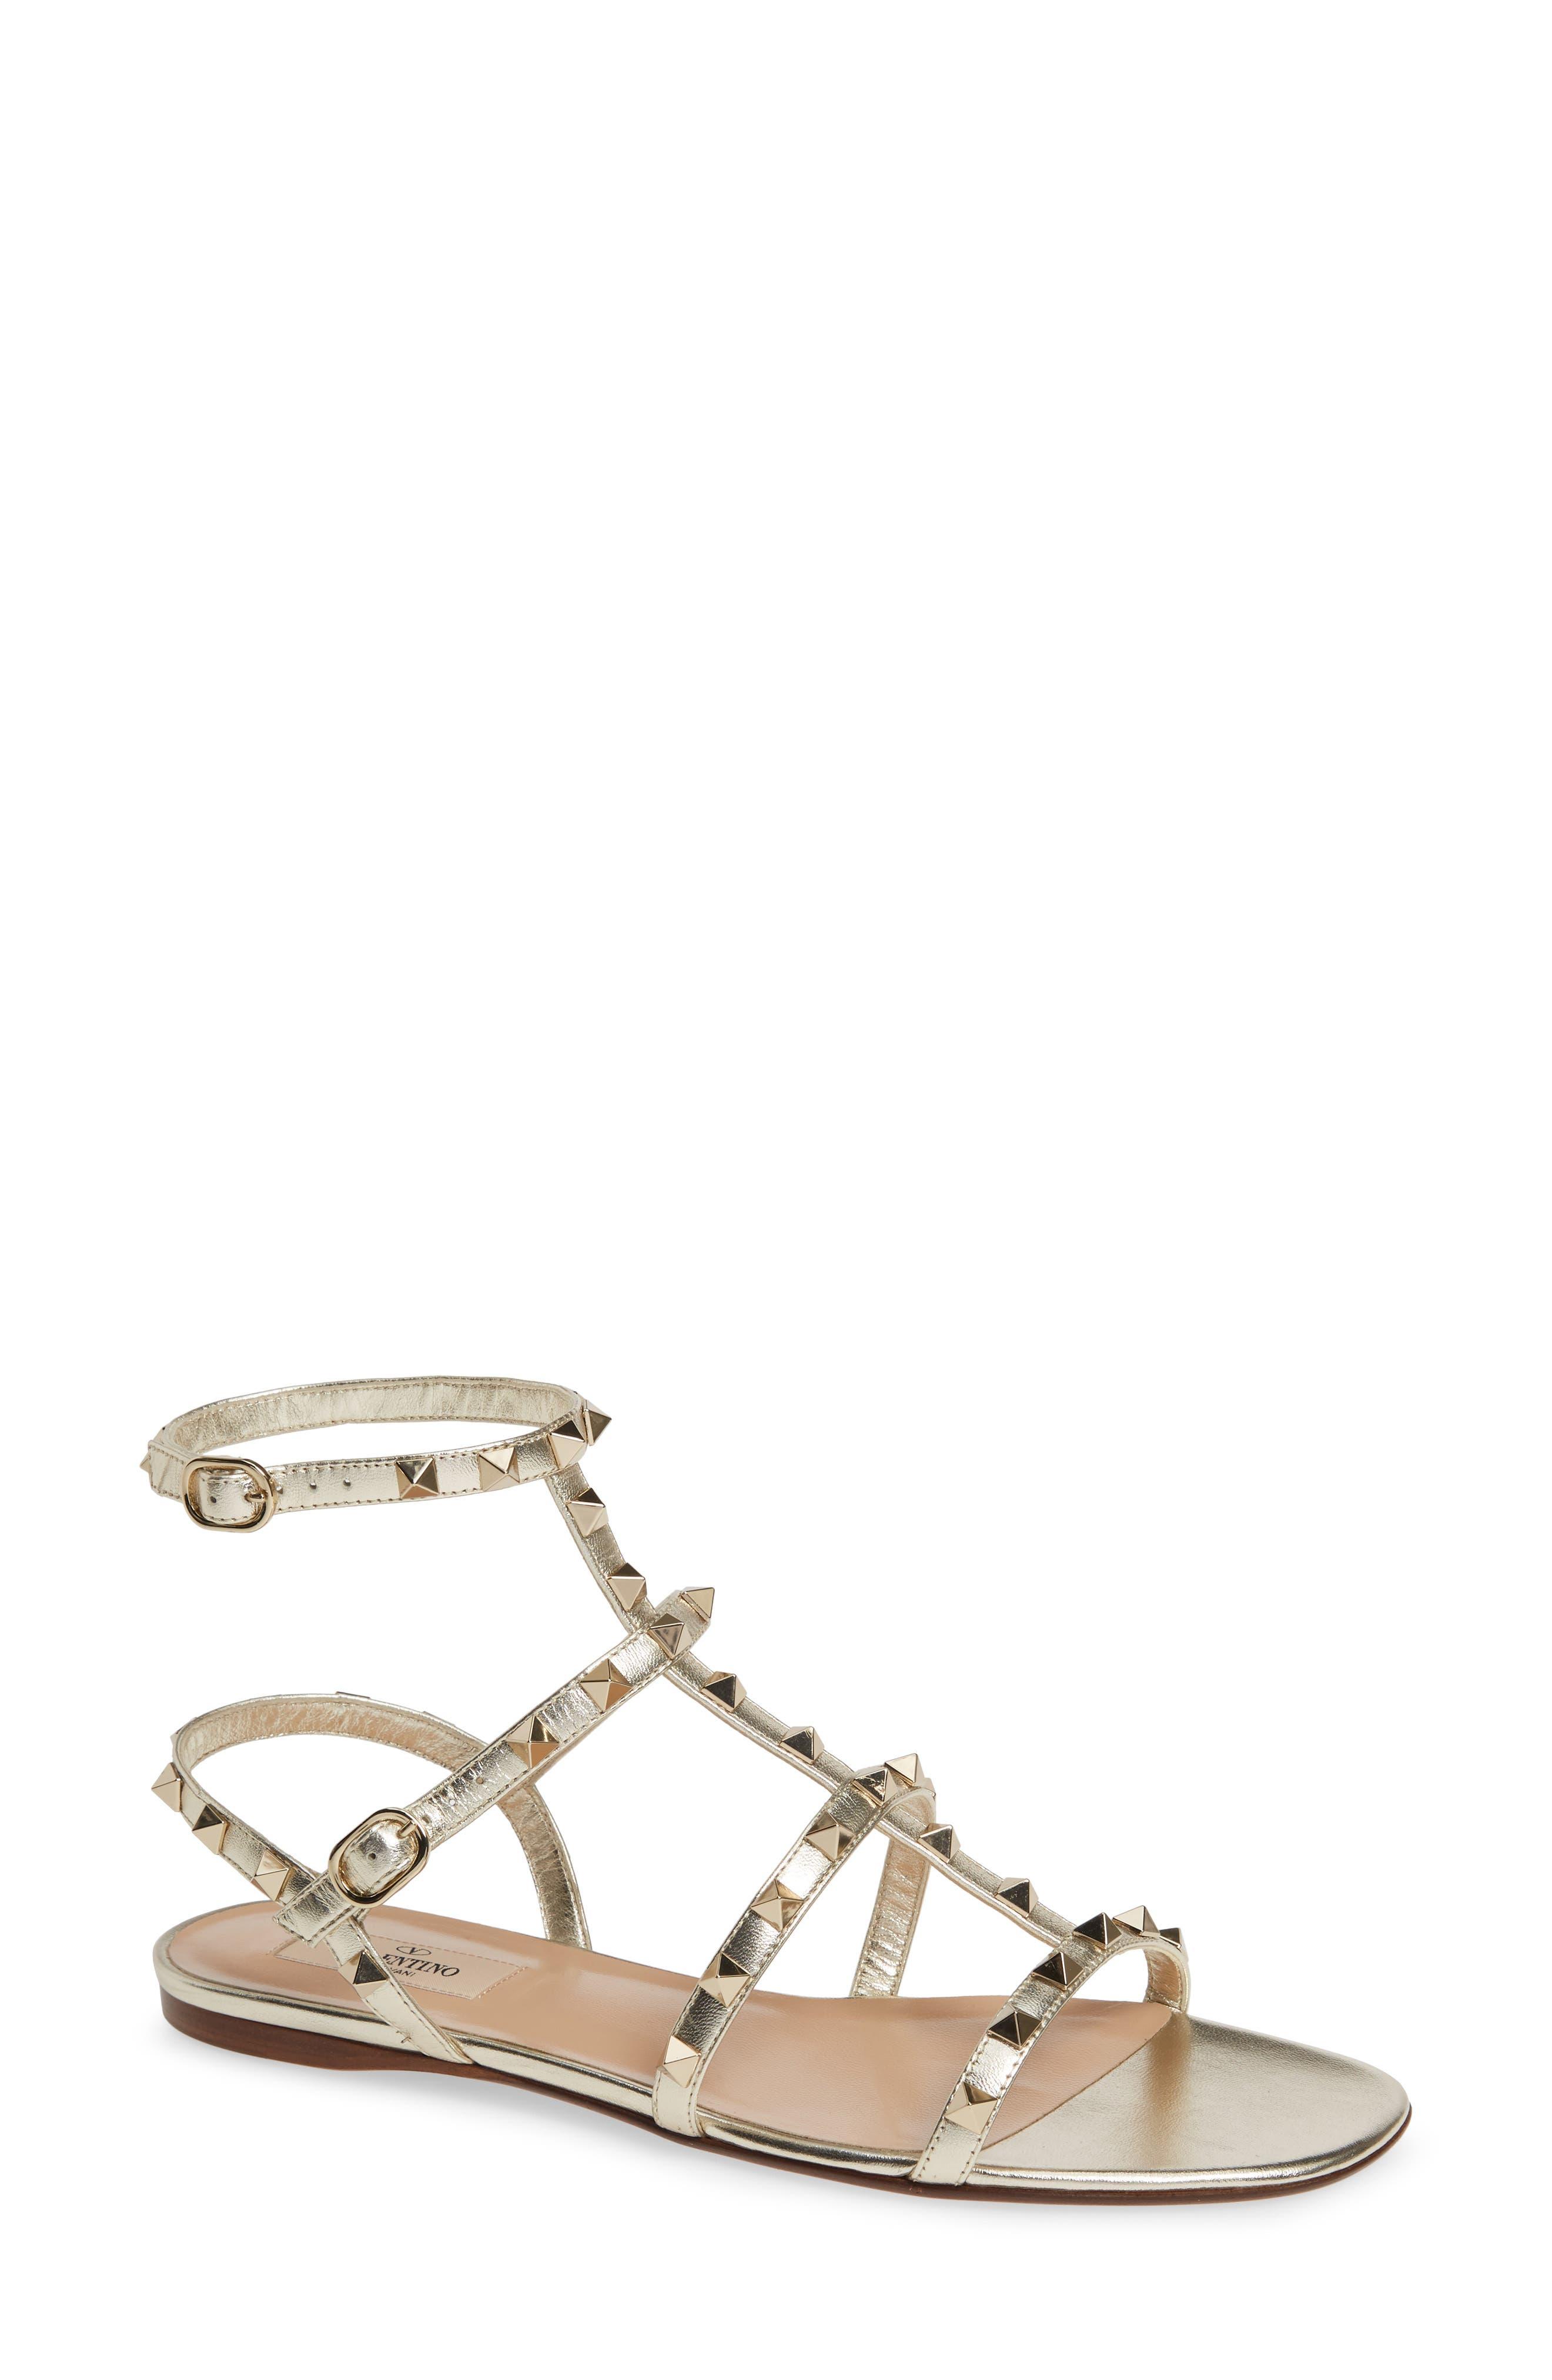 Rockstud Metallic Gladiator Sandal, Main, color, PLATINO